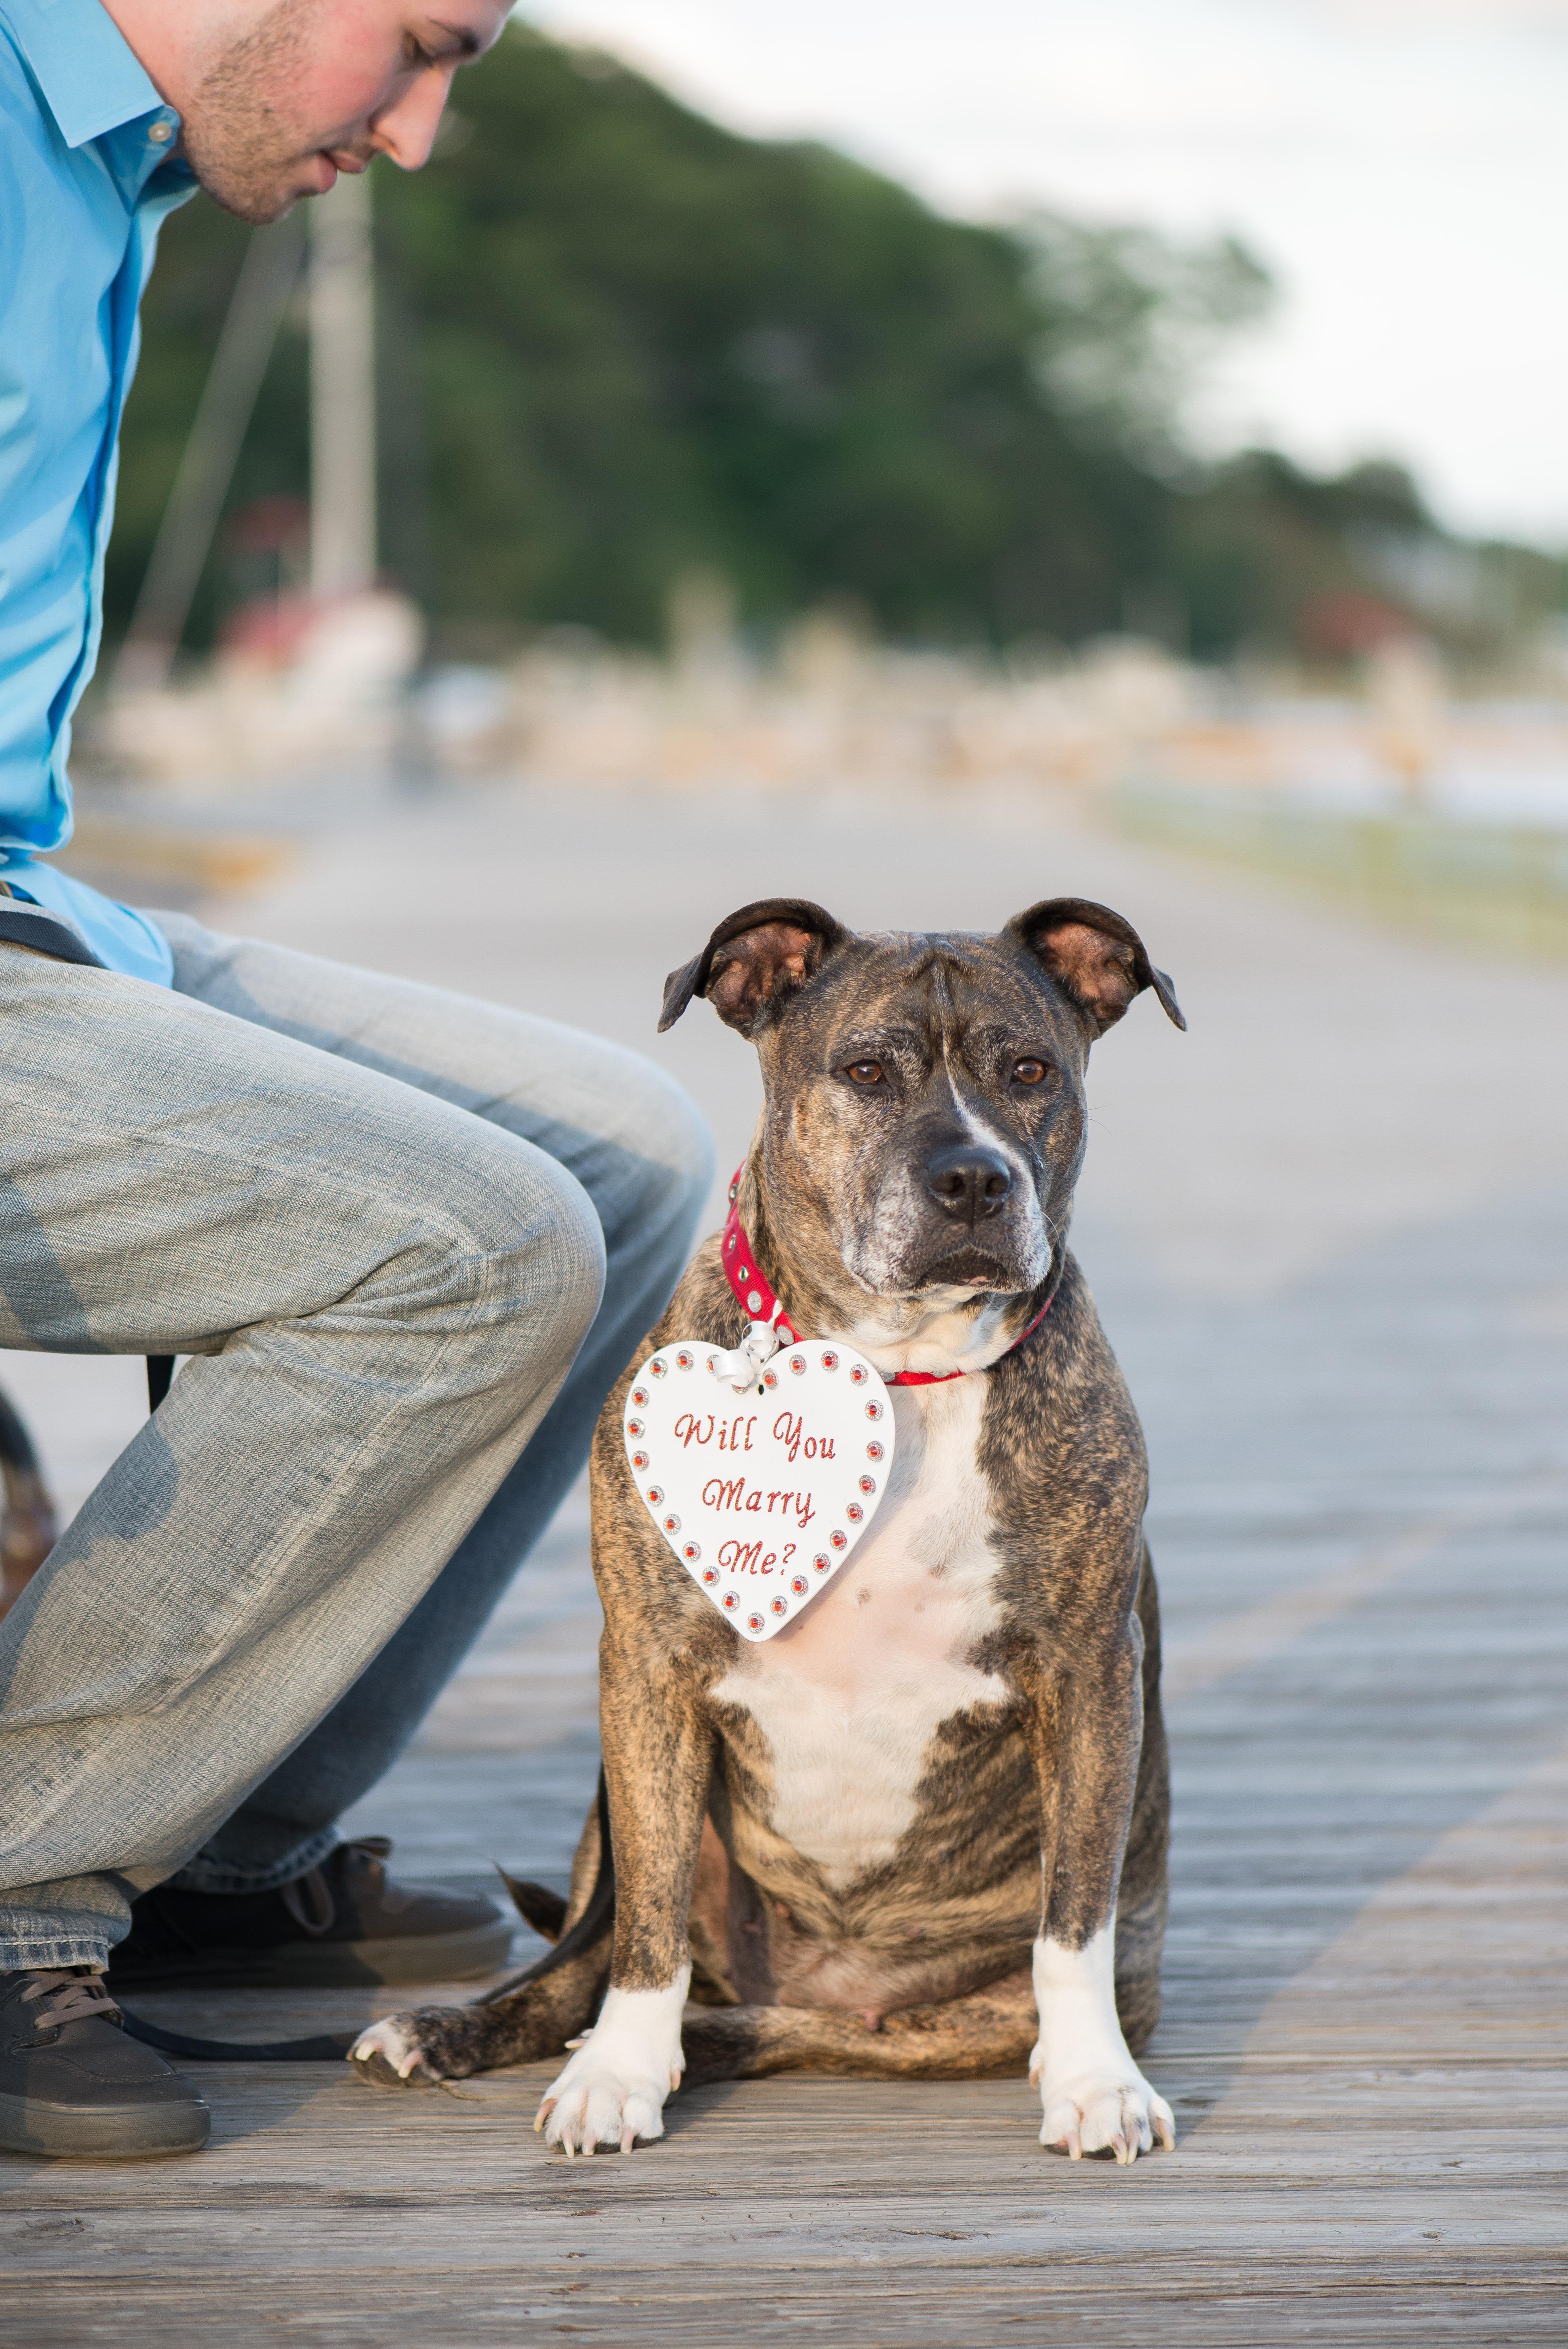 Image 4 of Dog Helps with Scavenger Hunt Proposal